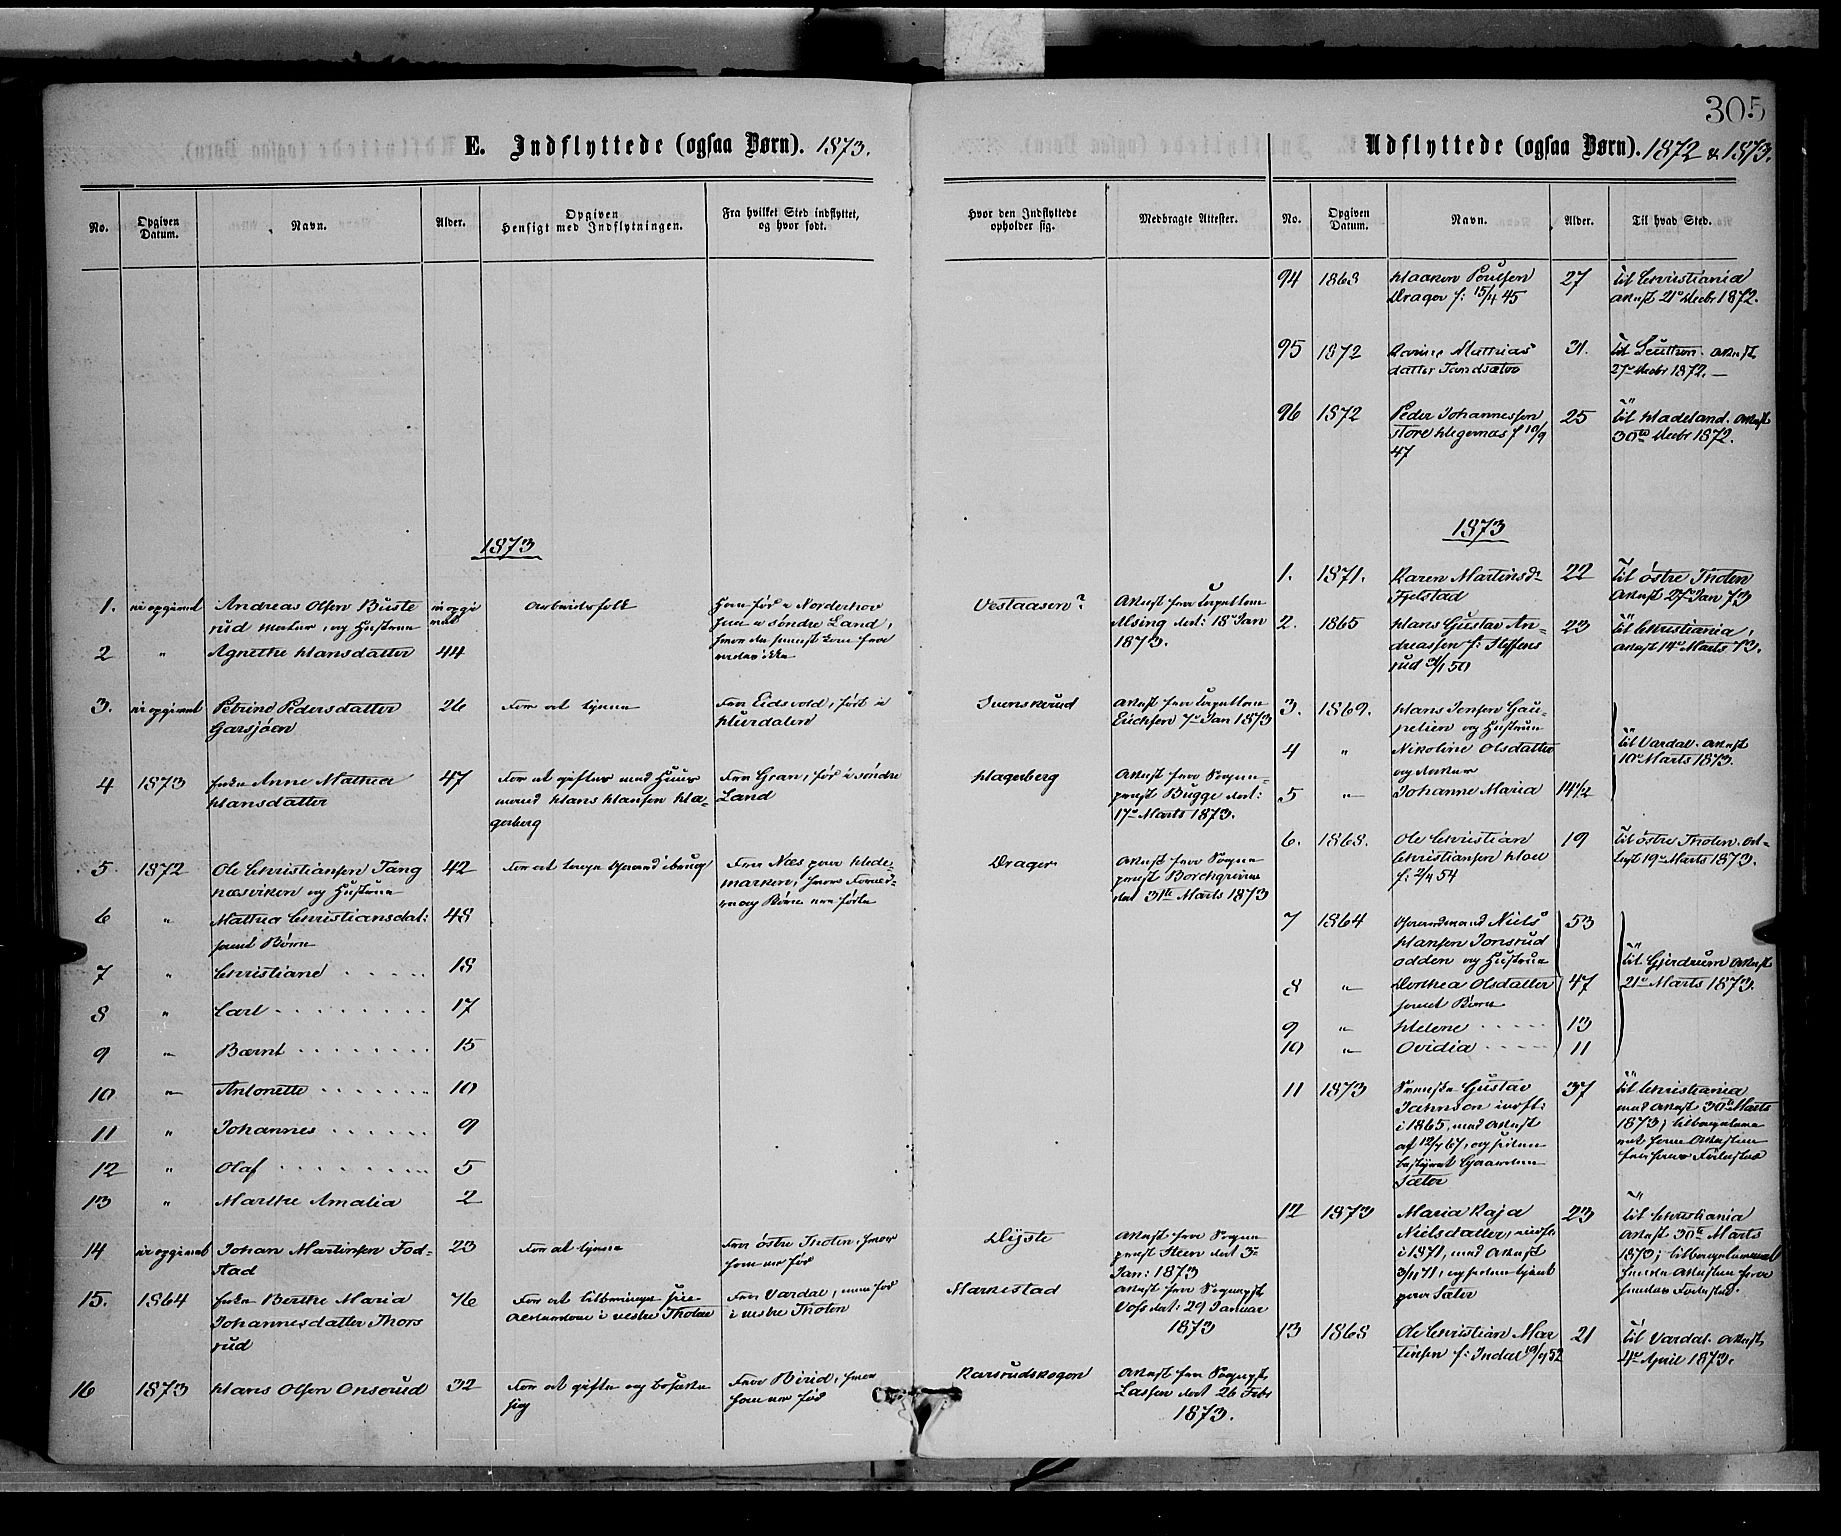 SAH, Vestre Toten prestekontor, H/Ha/Haa/L0008: Ministerialbok nr. 8, 1870-1877, s. 305